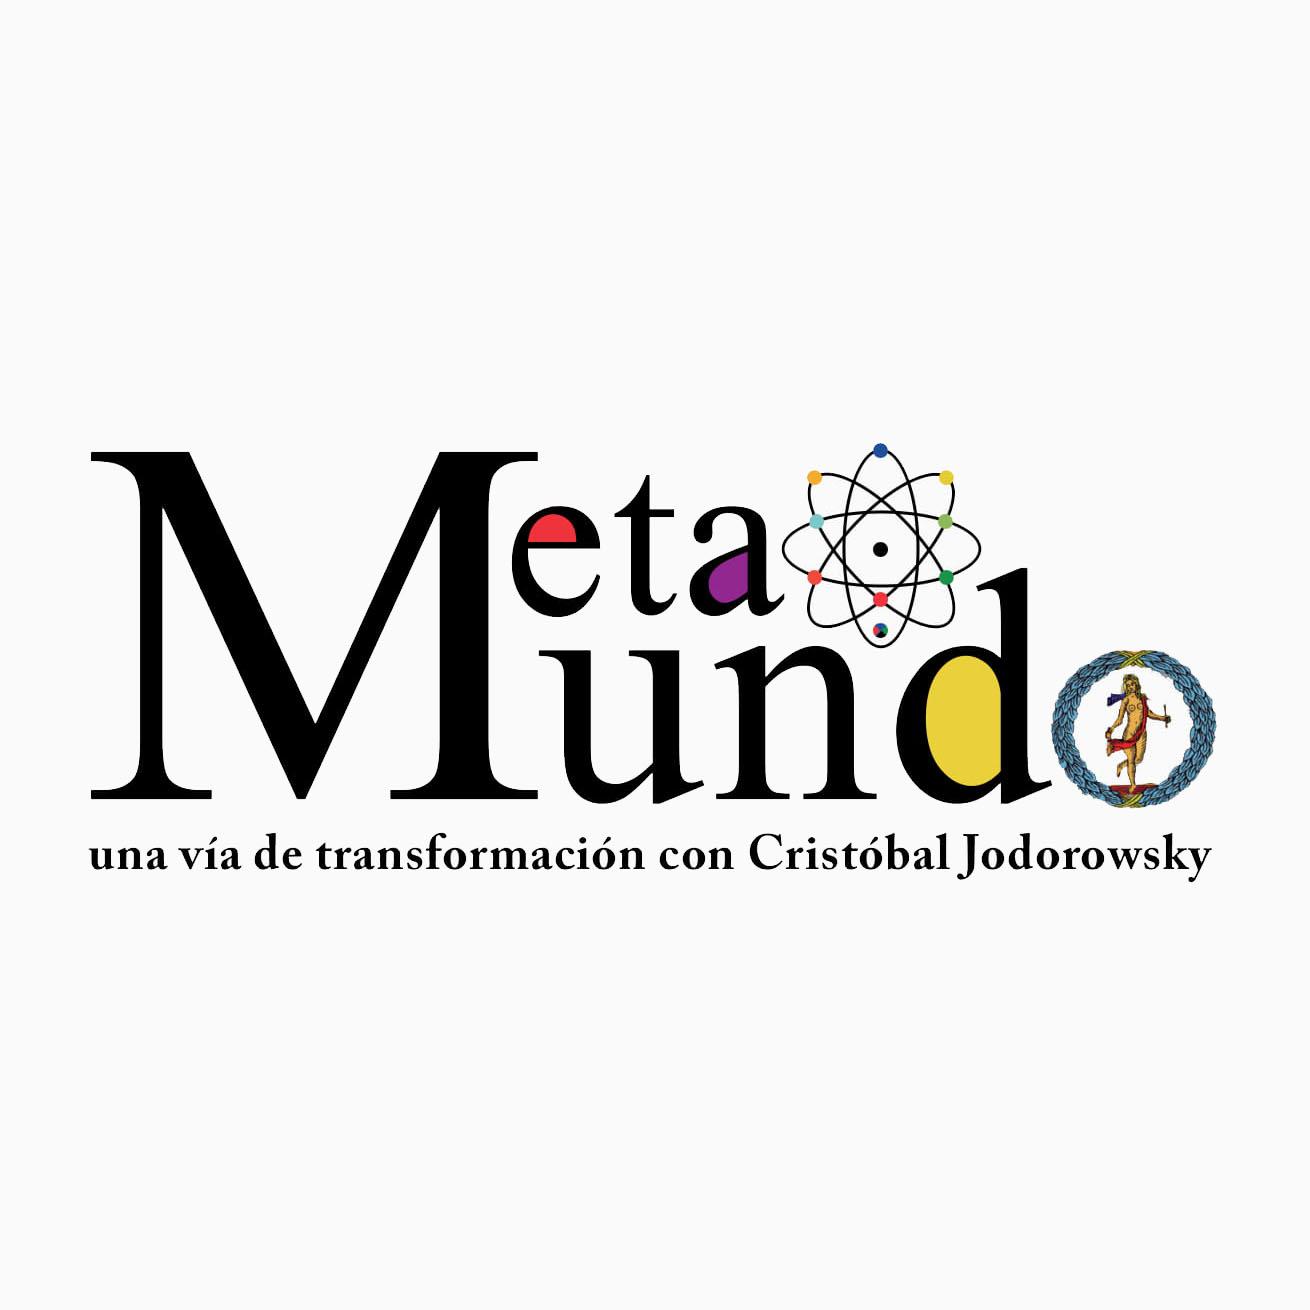 METAMUNDO image